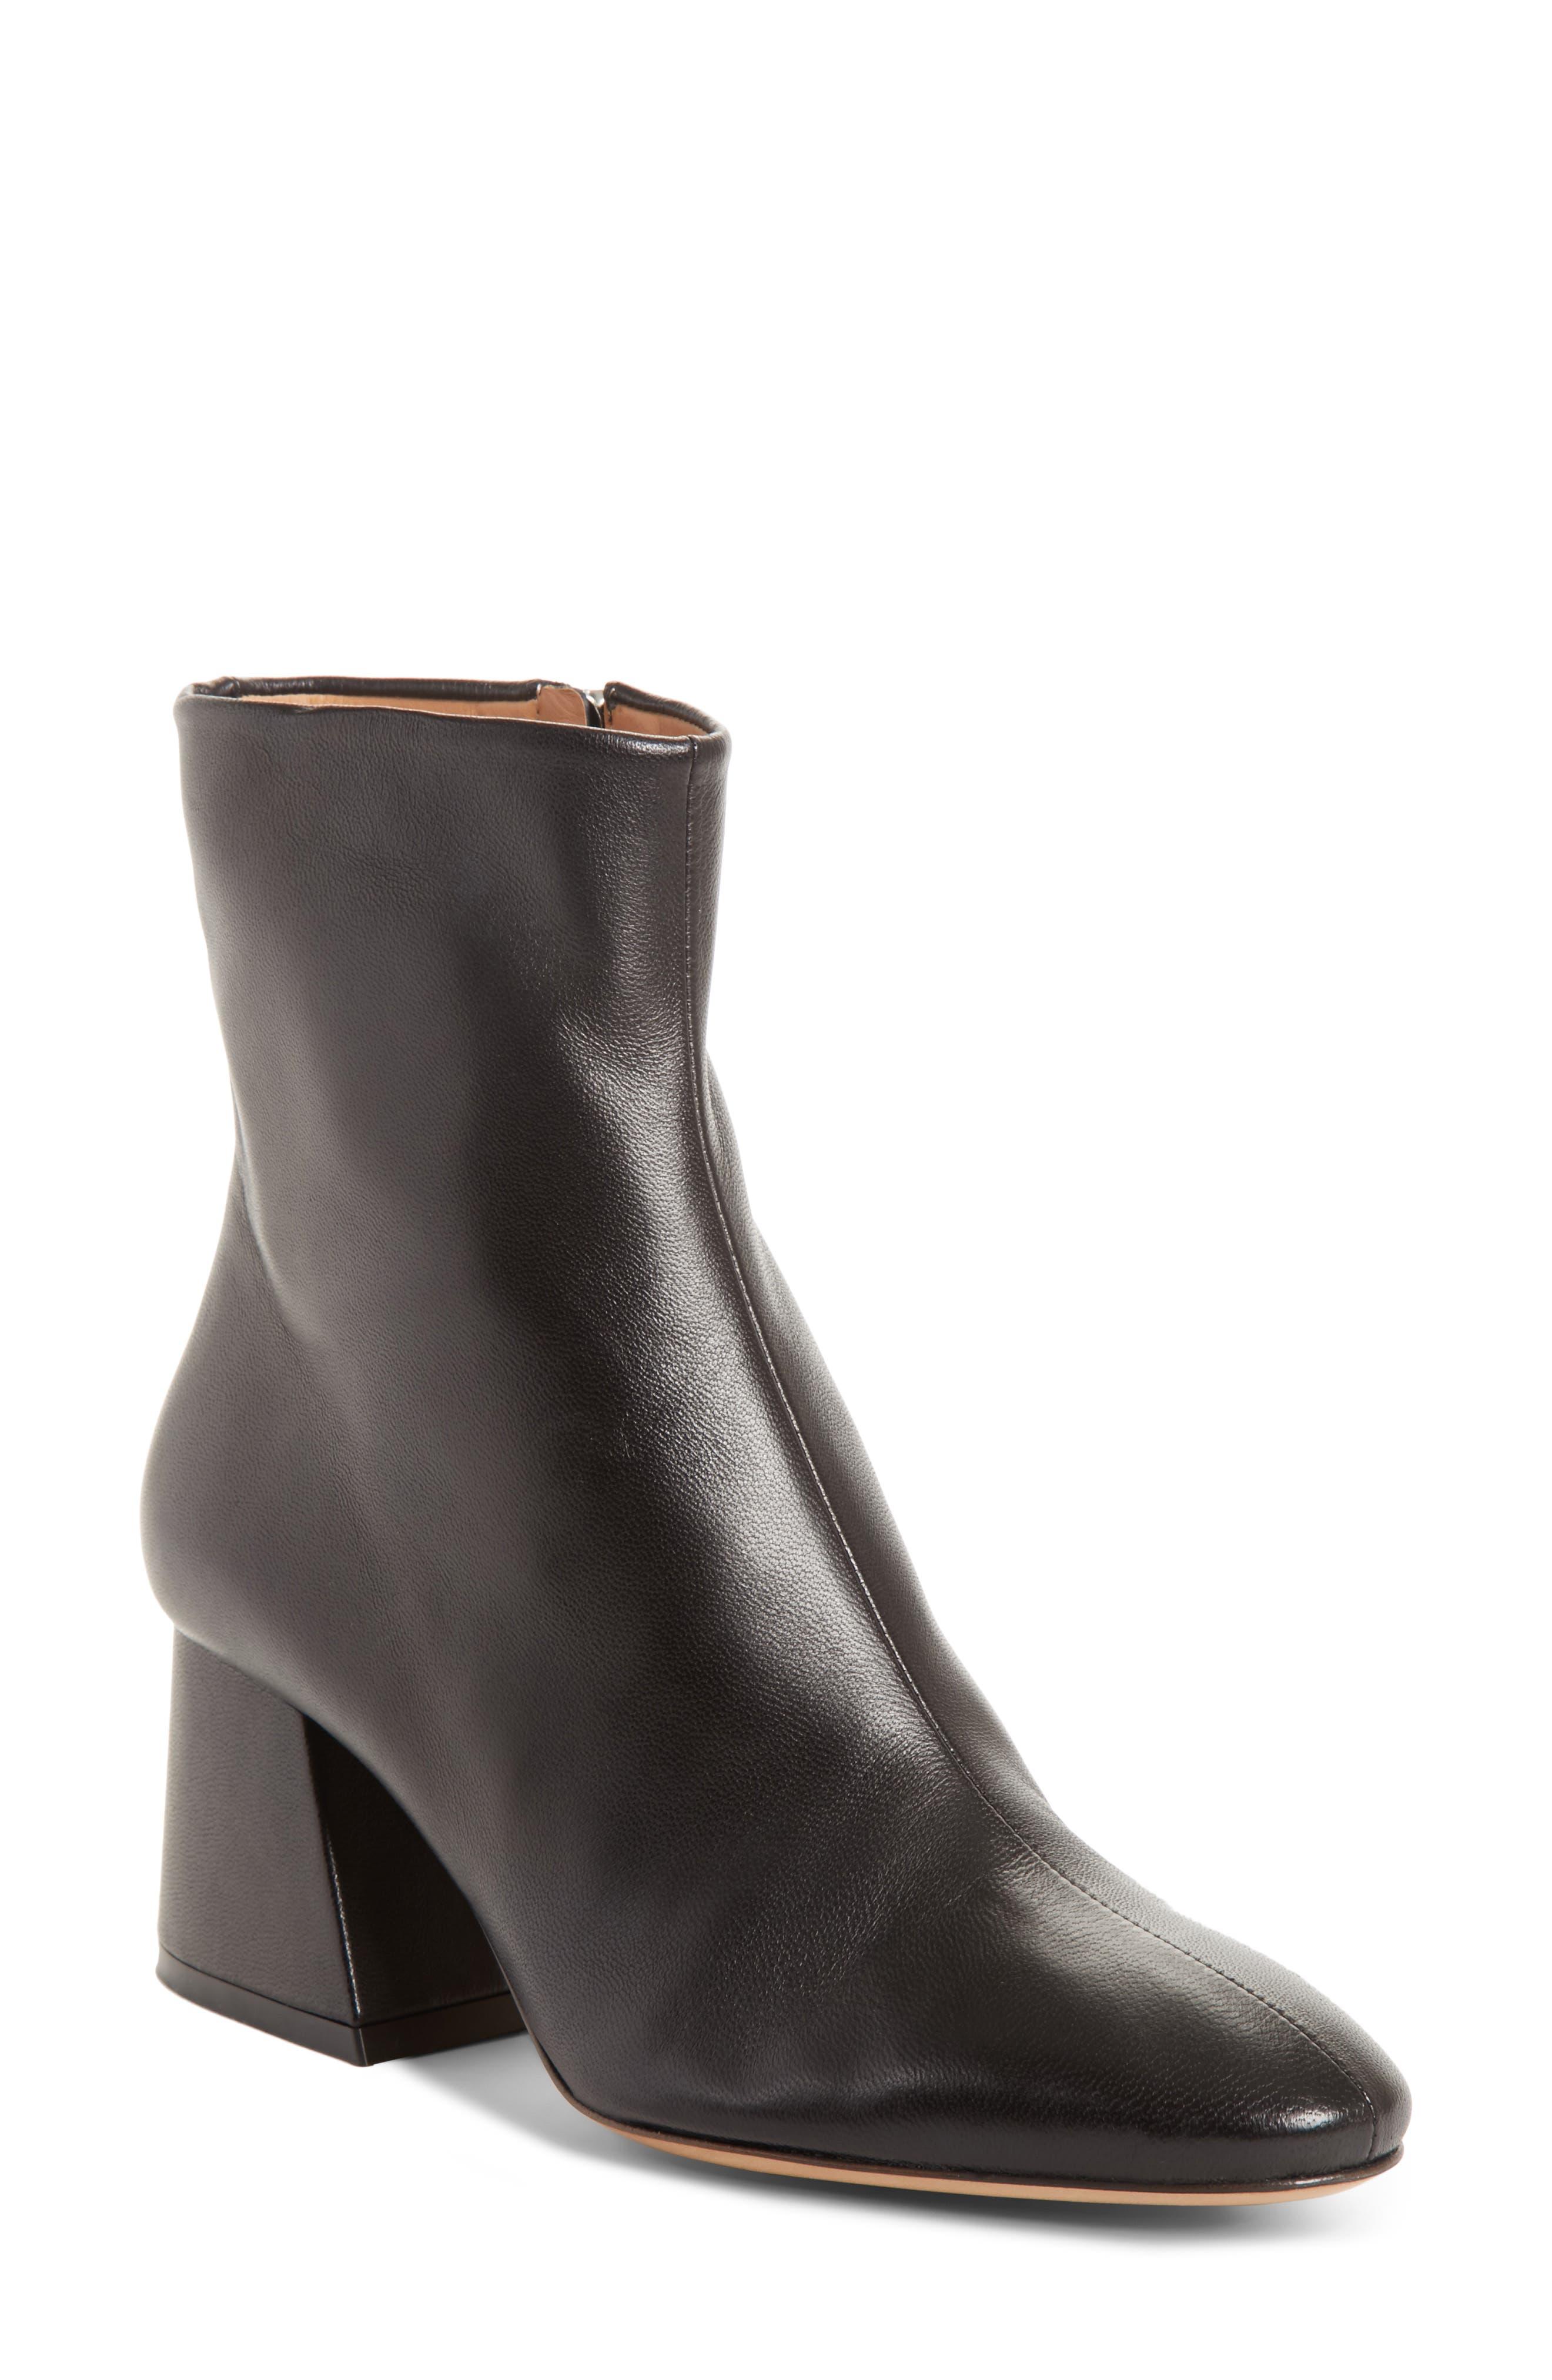 Maison Margiela Flare Heel Ankle Boot (Women)